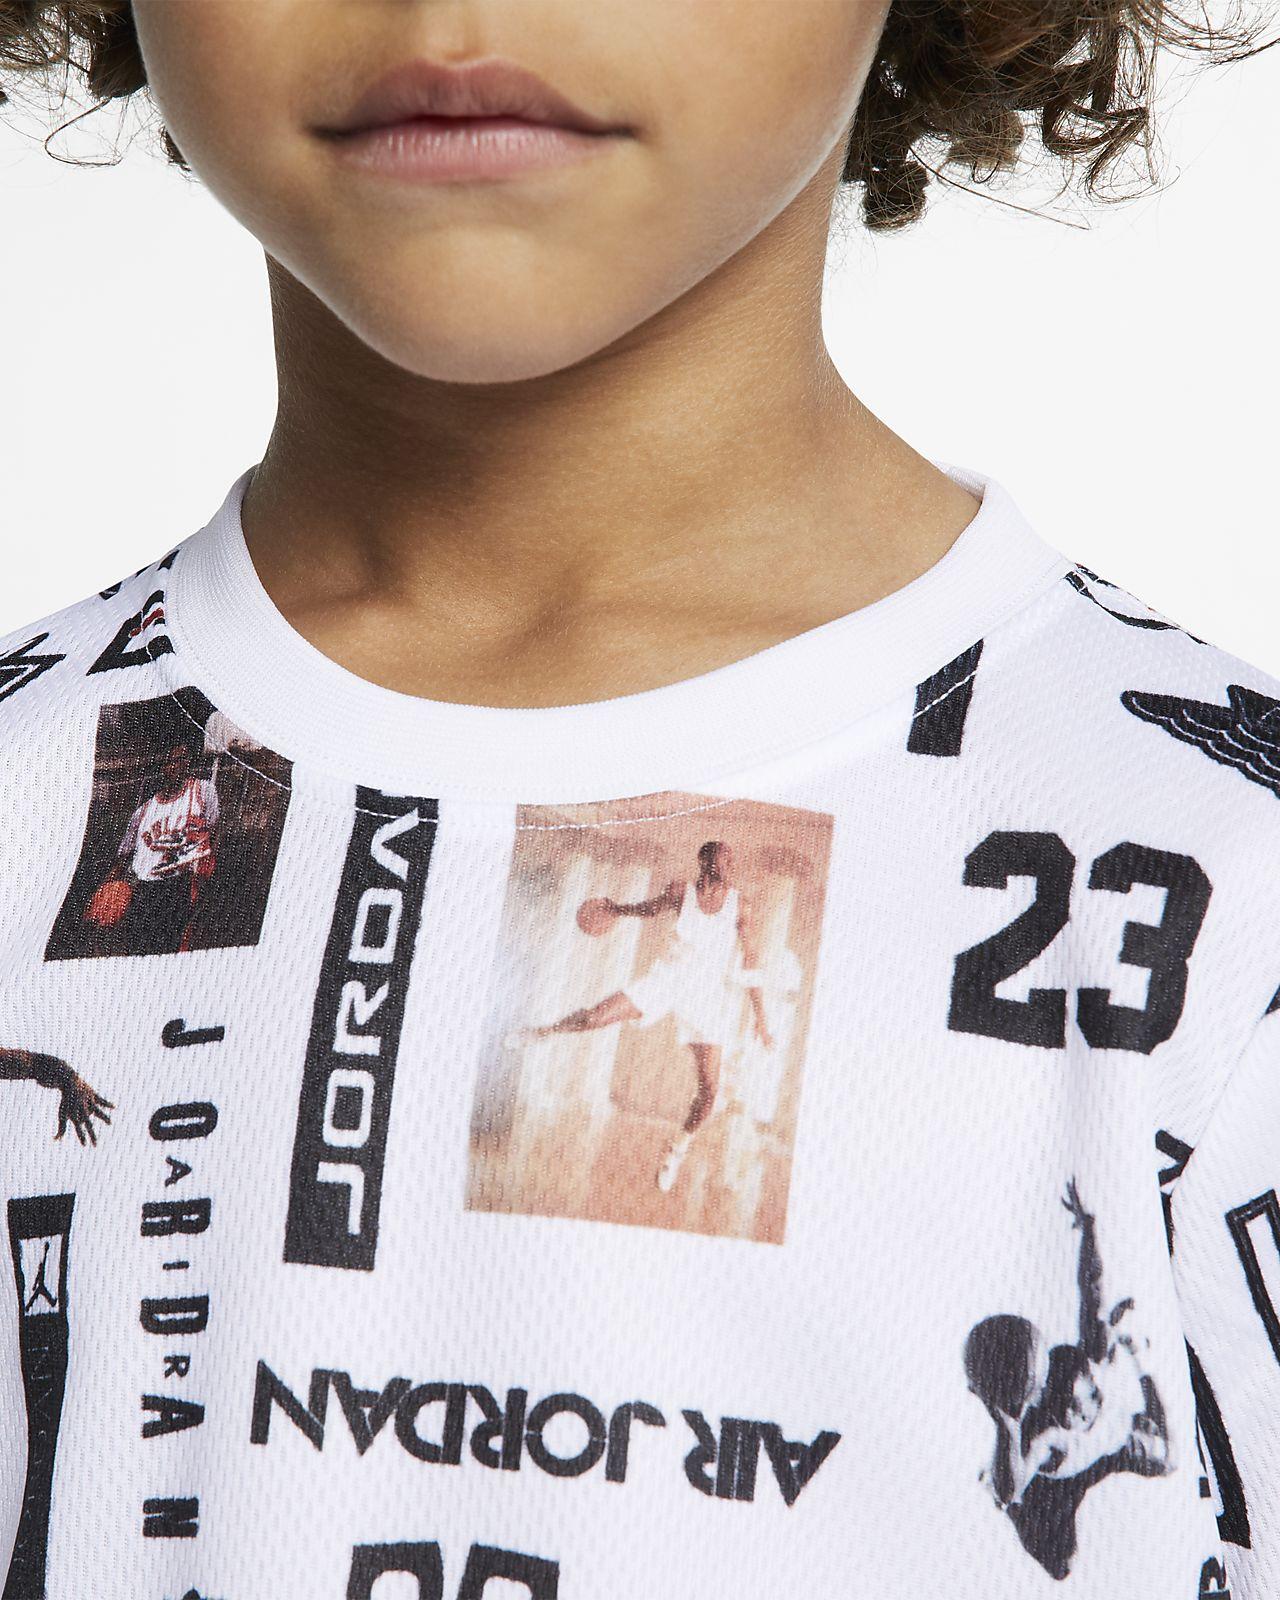 b398d2f24b1e Jordan Sportswear Little Kids  Mesh T-Shirt. Nike.com